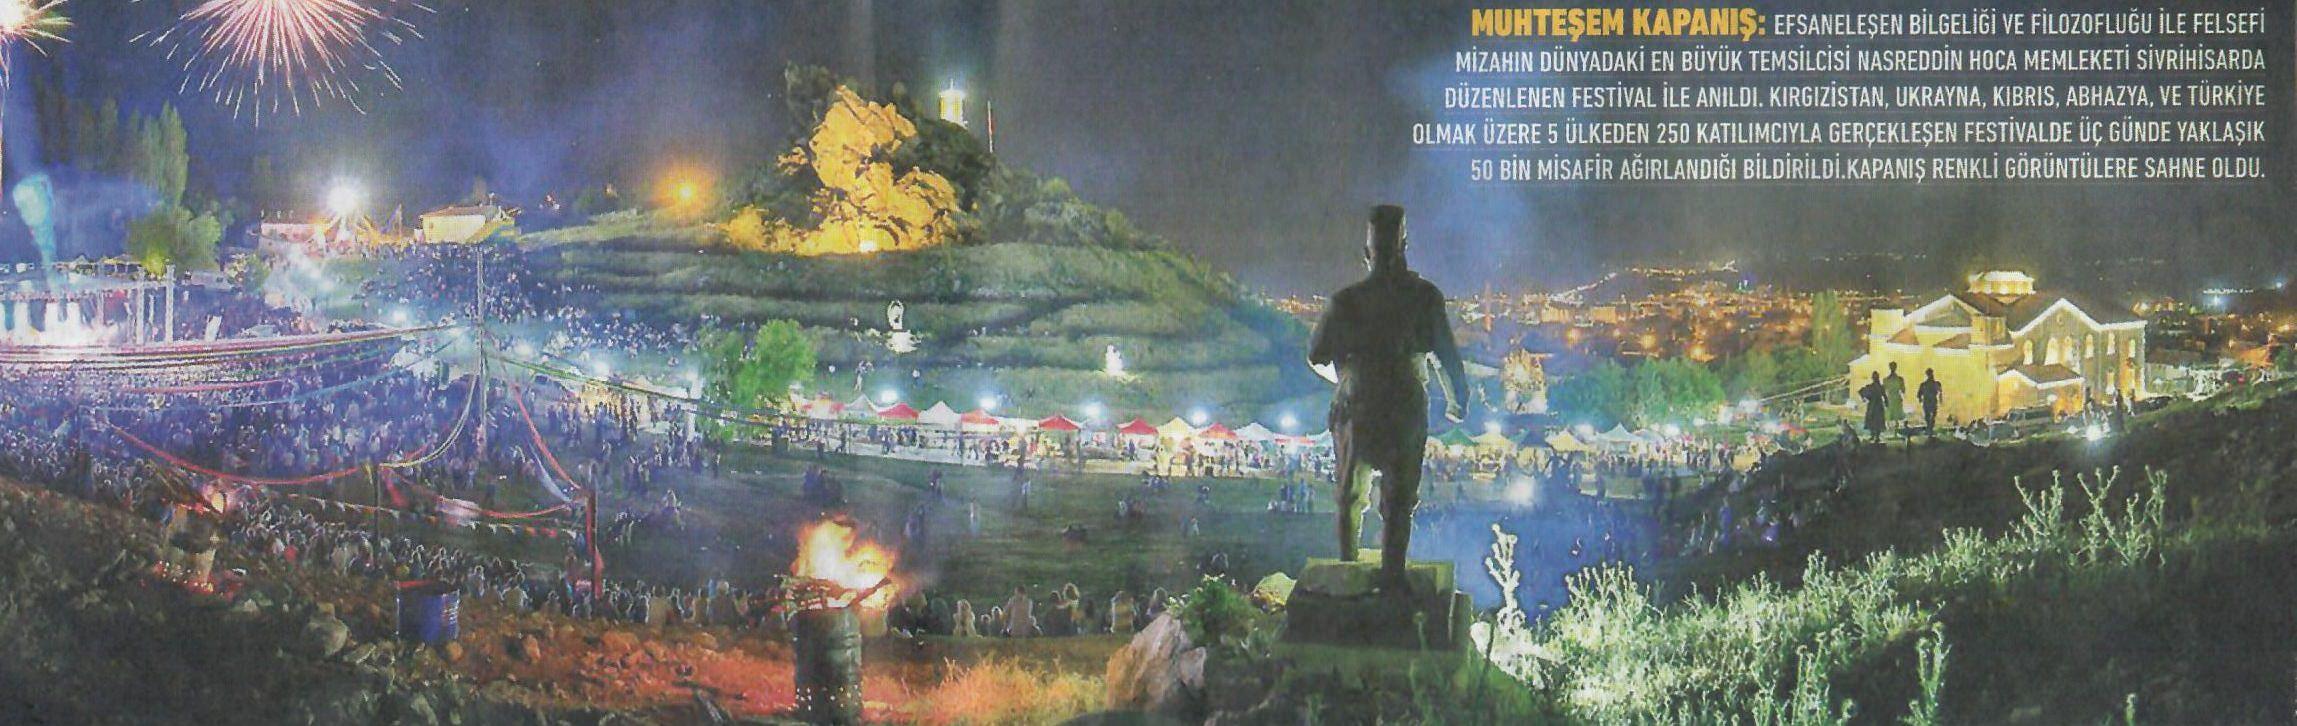 Nasreddin Hoca Festivali Muhteşem Kapanış